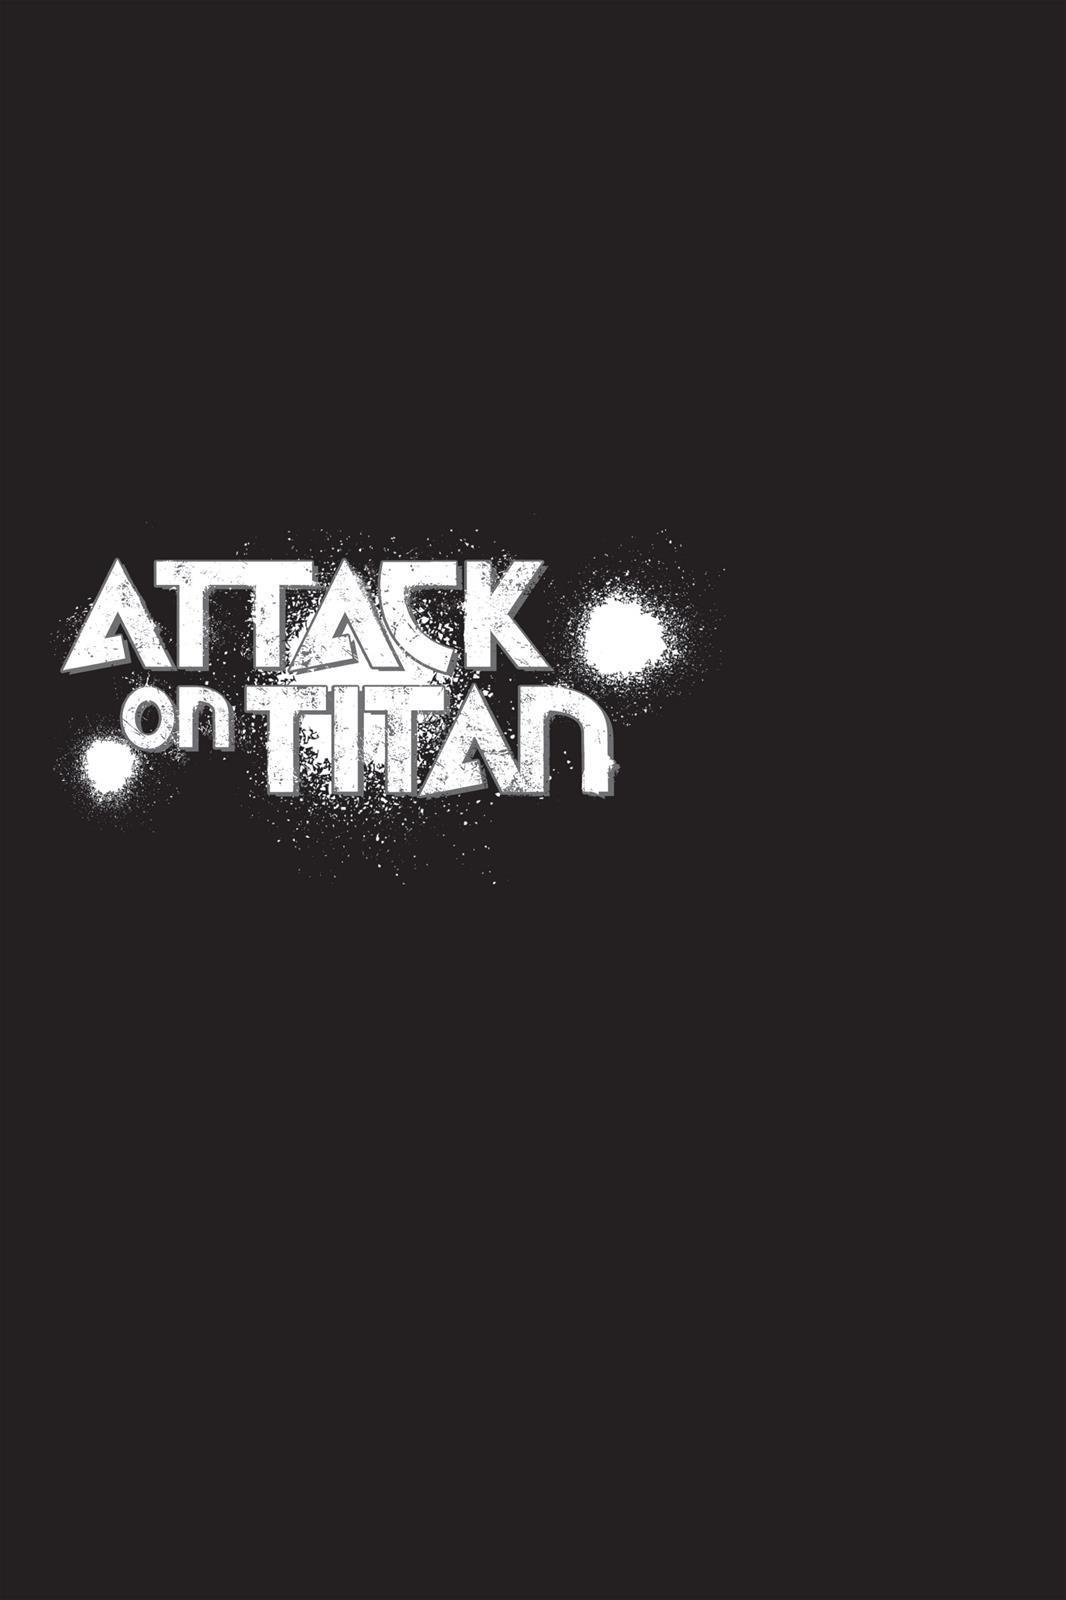 Attack On Titan, Episode 9.5 image 025